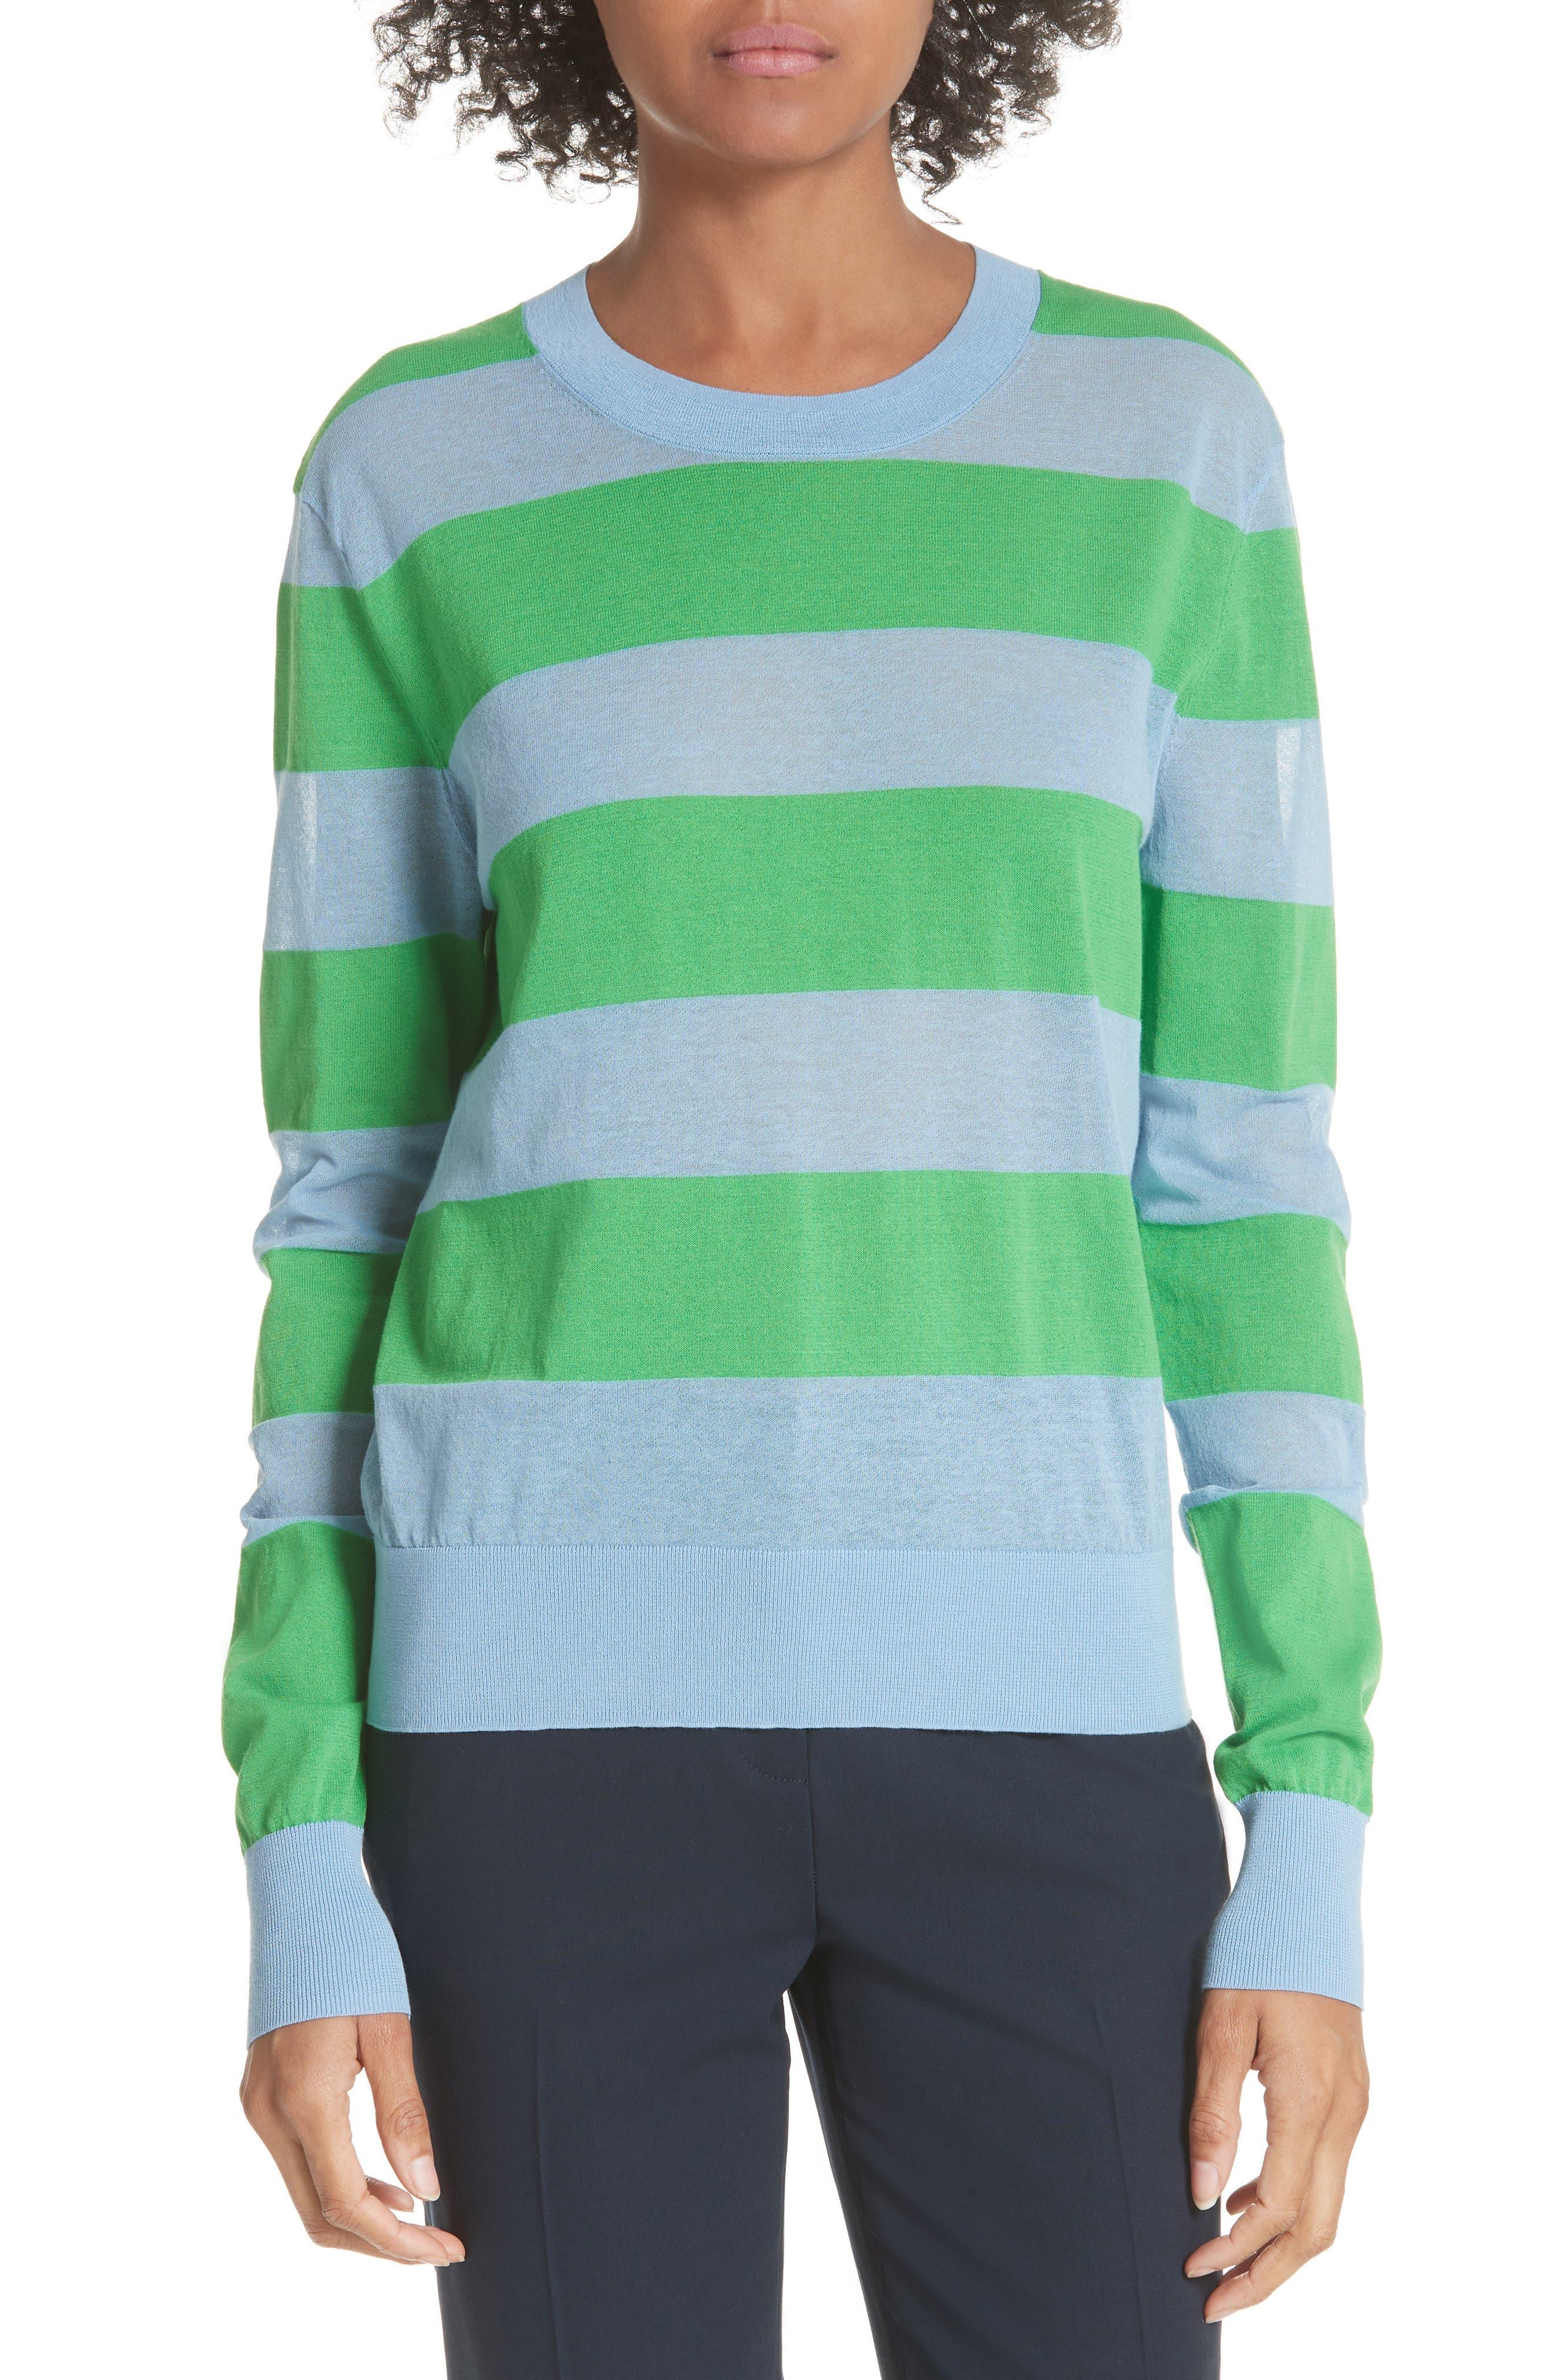 Diane von Furstenberg Colorblock Stripe Sweater,                             Main thumbnail 1, color,                             415